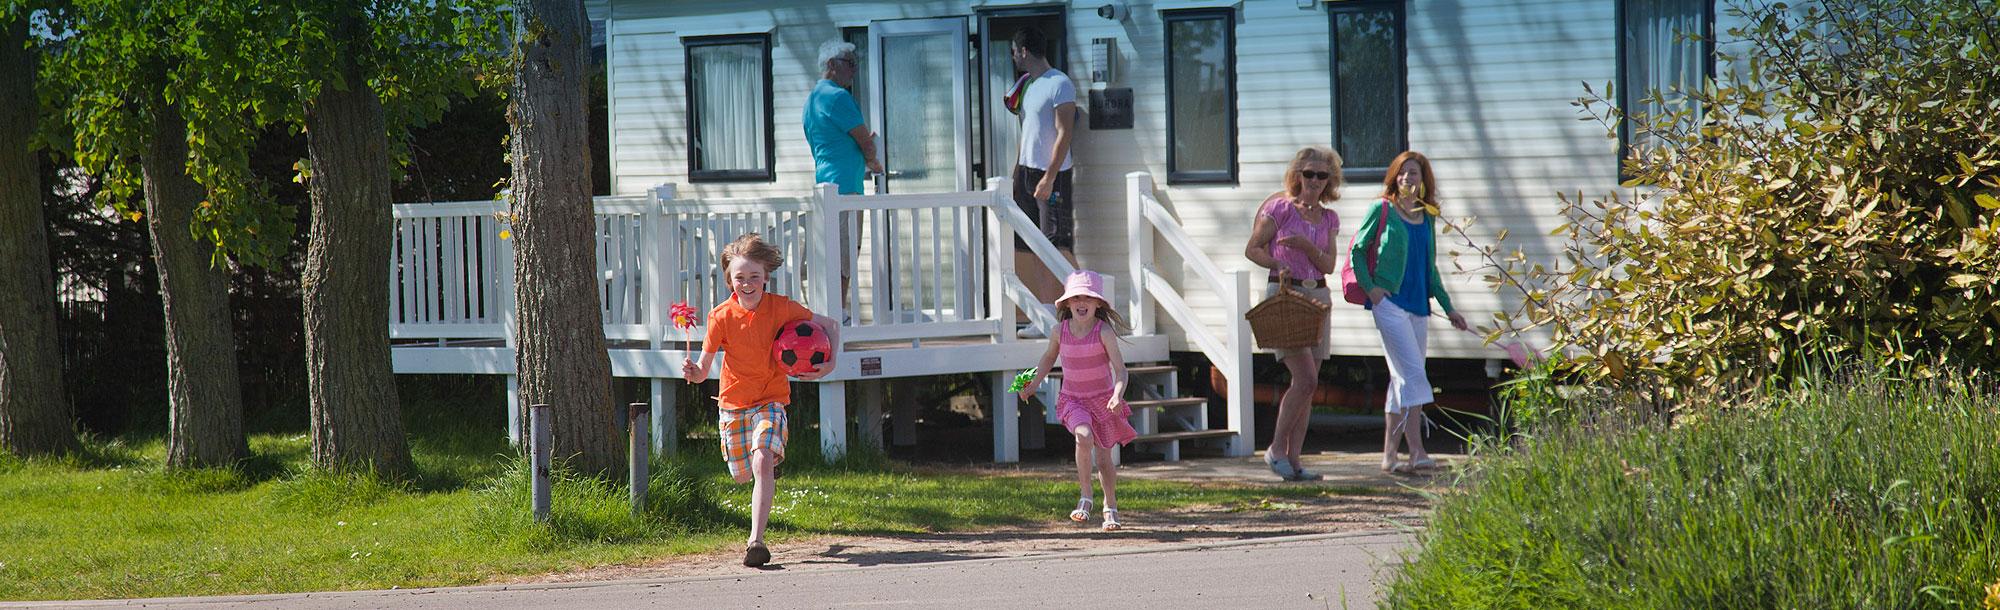 Waldegraves holiday park, Essex - Caravan holidays